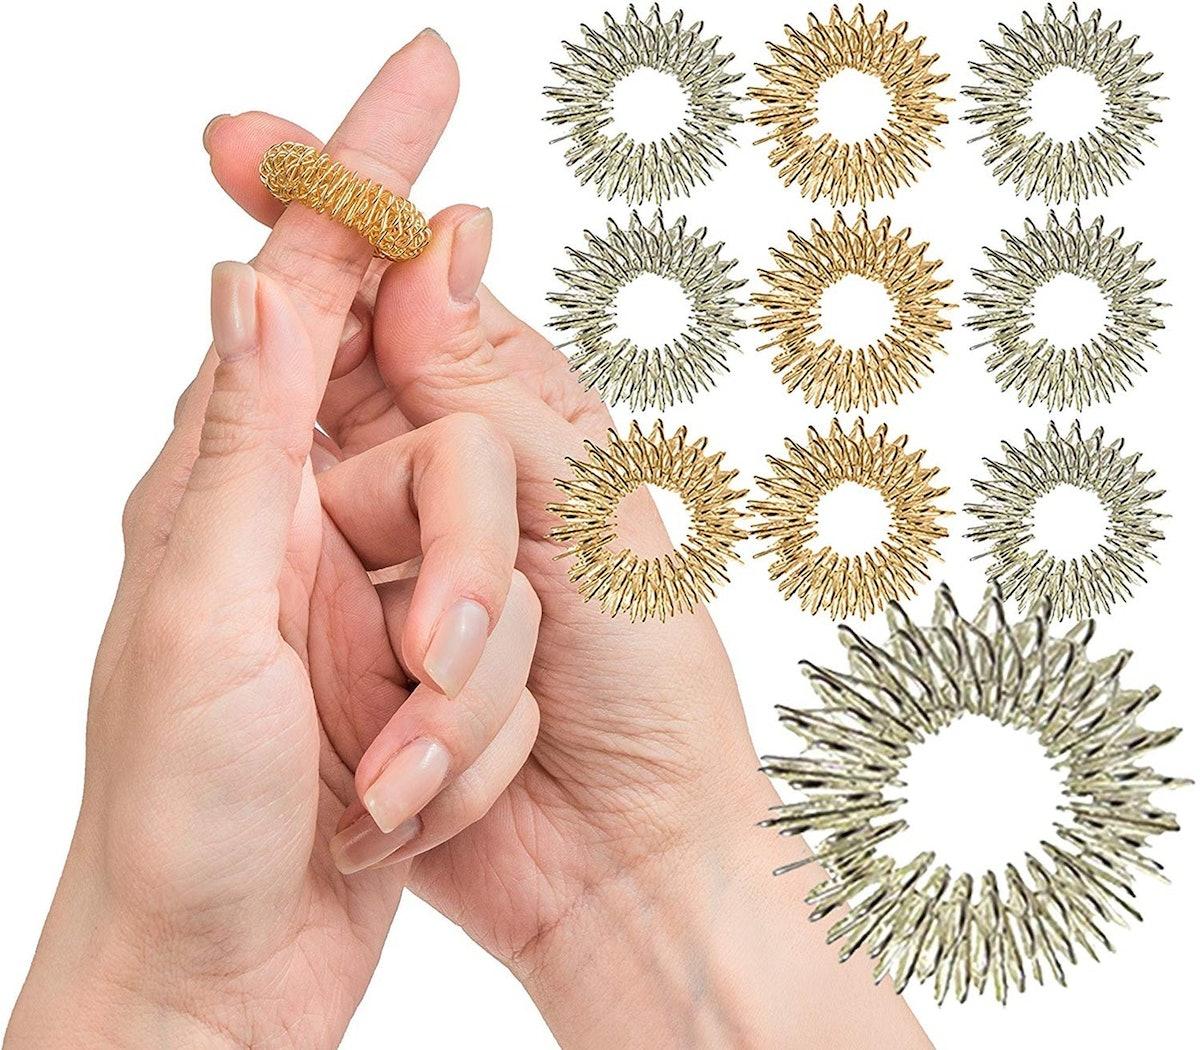 Impresa Products Spiky Sensory Finger Rings (10-Pack)